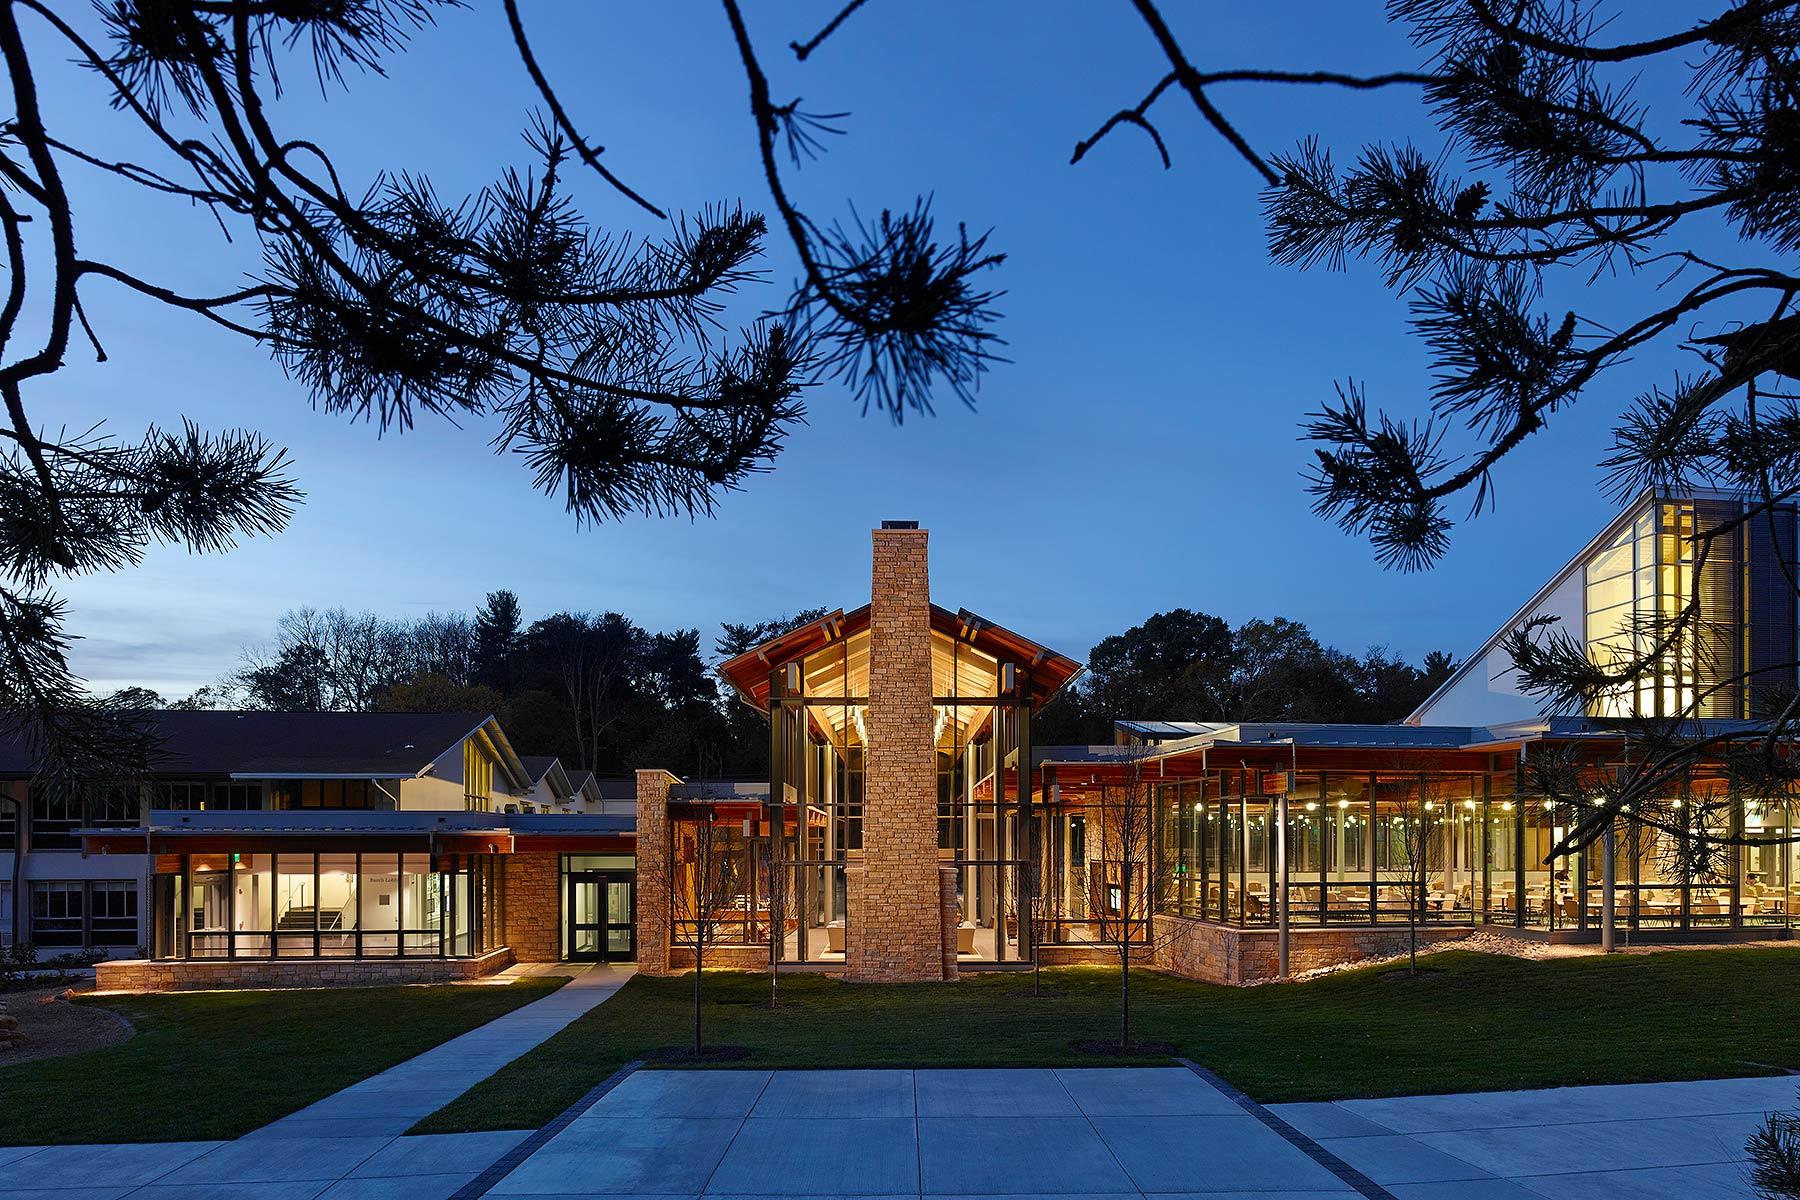 Agnes Irwin School Bohlin Cywinski Jackson Radnor, PA